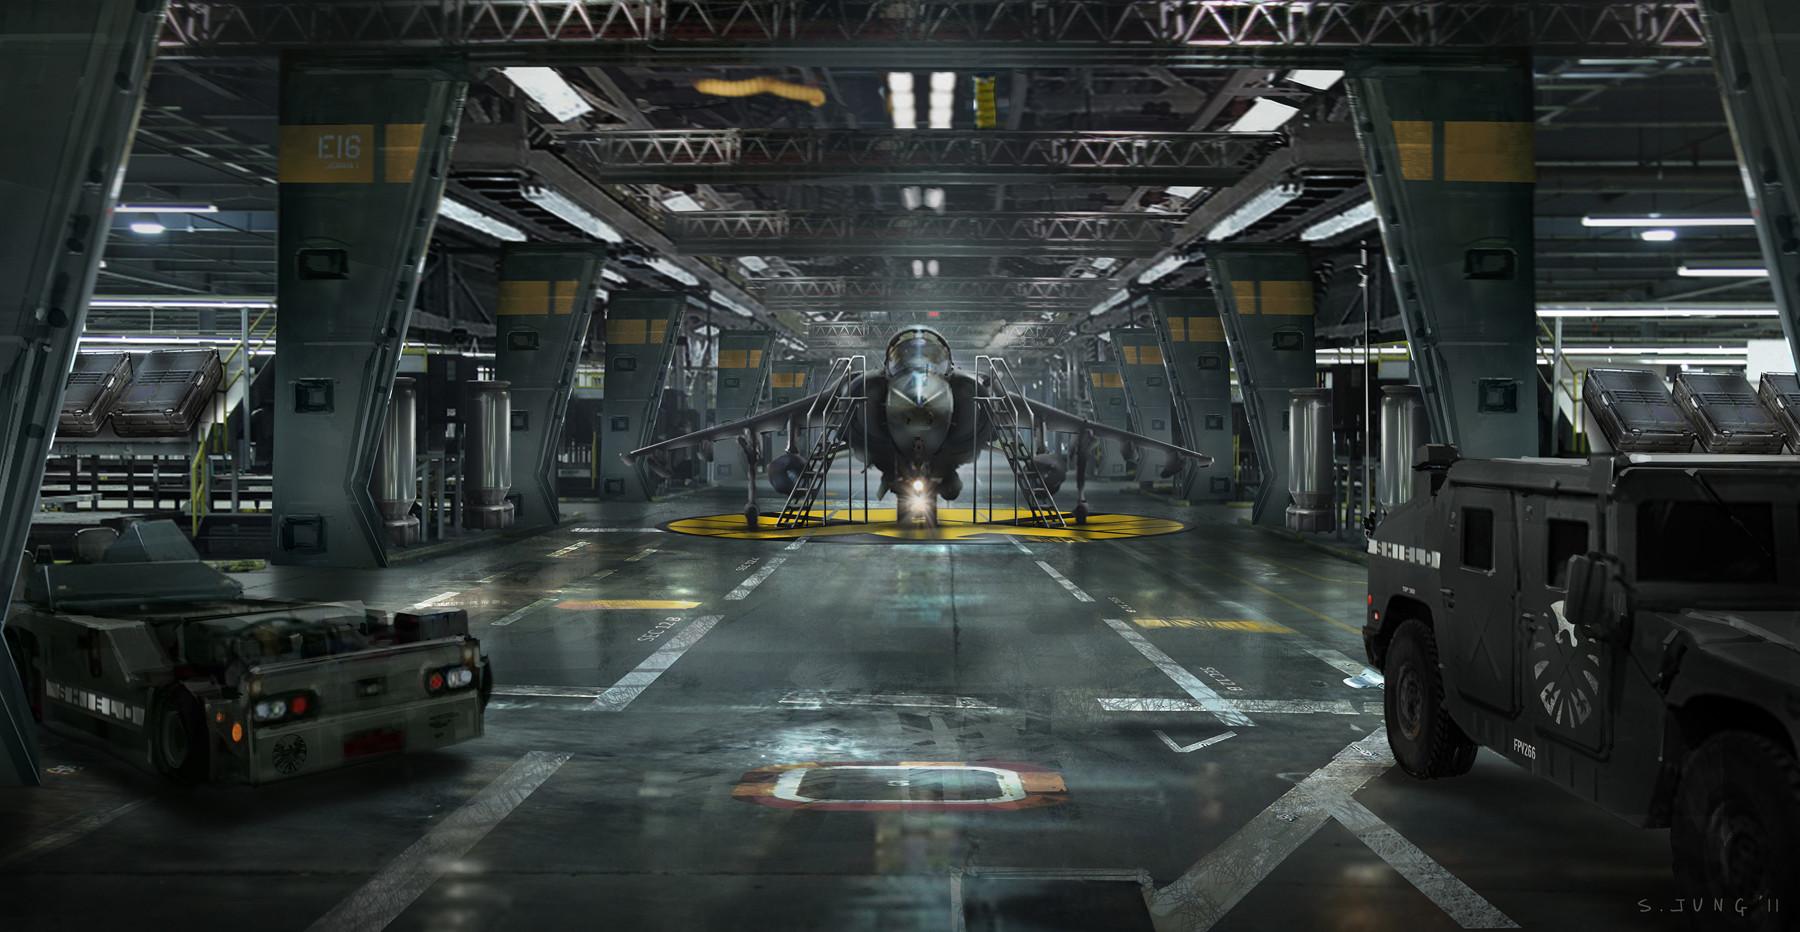 Steve jung new lower hangar update low